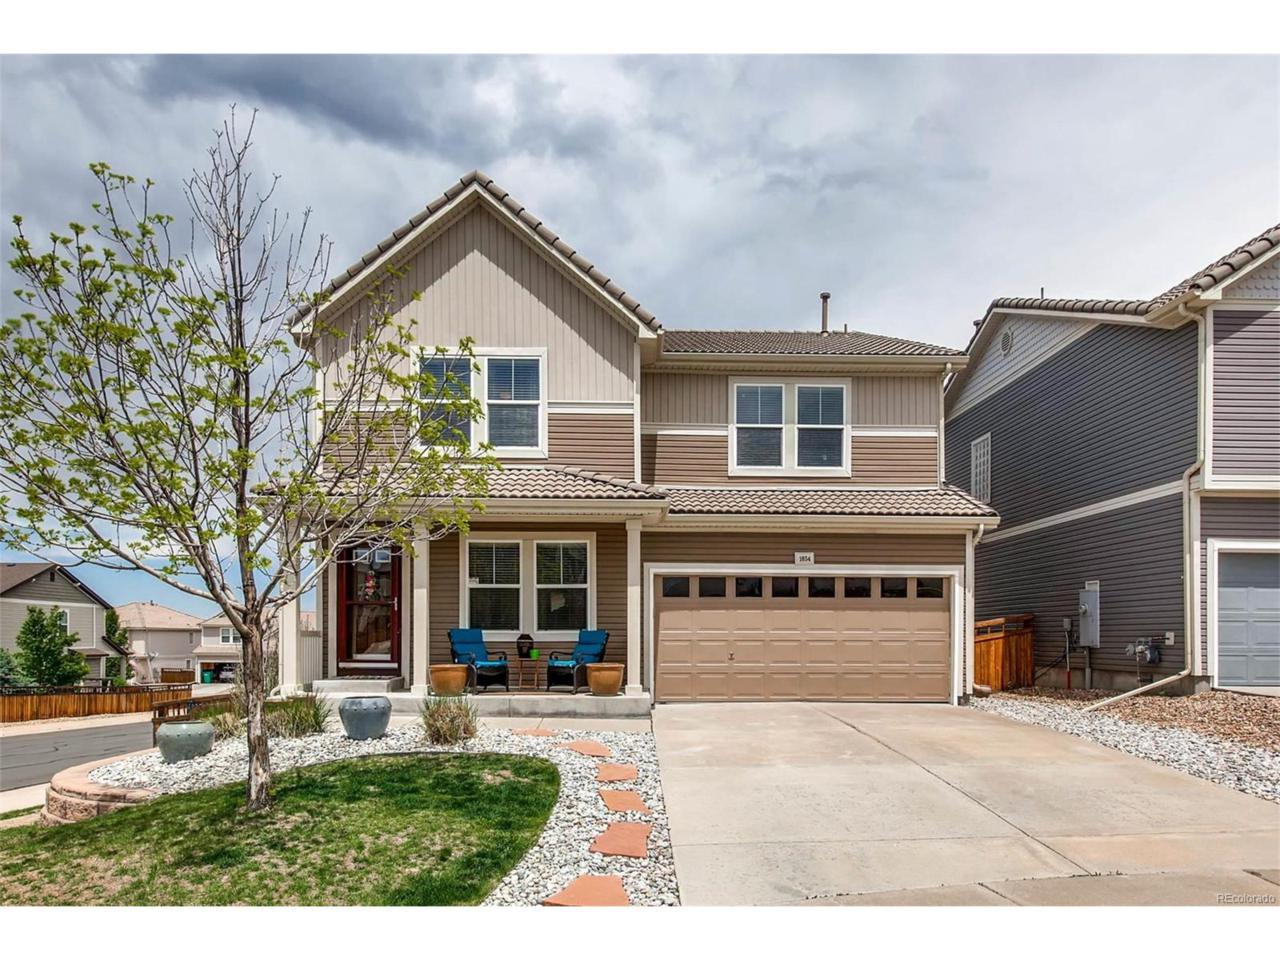 1854 Morningview Lane, Castle Rock, CO 80109 (MLS #3457800) :: 8z Real Estate